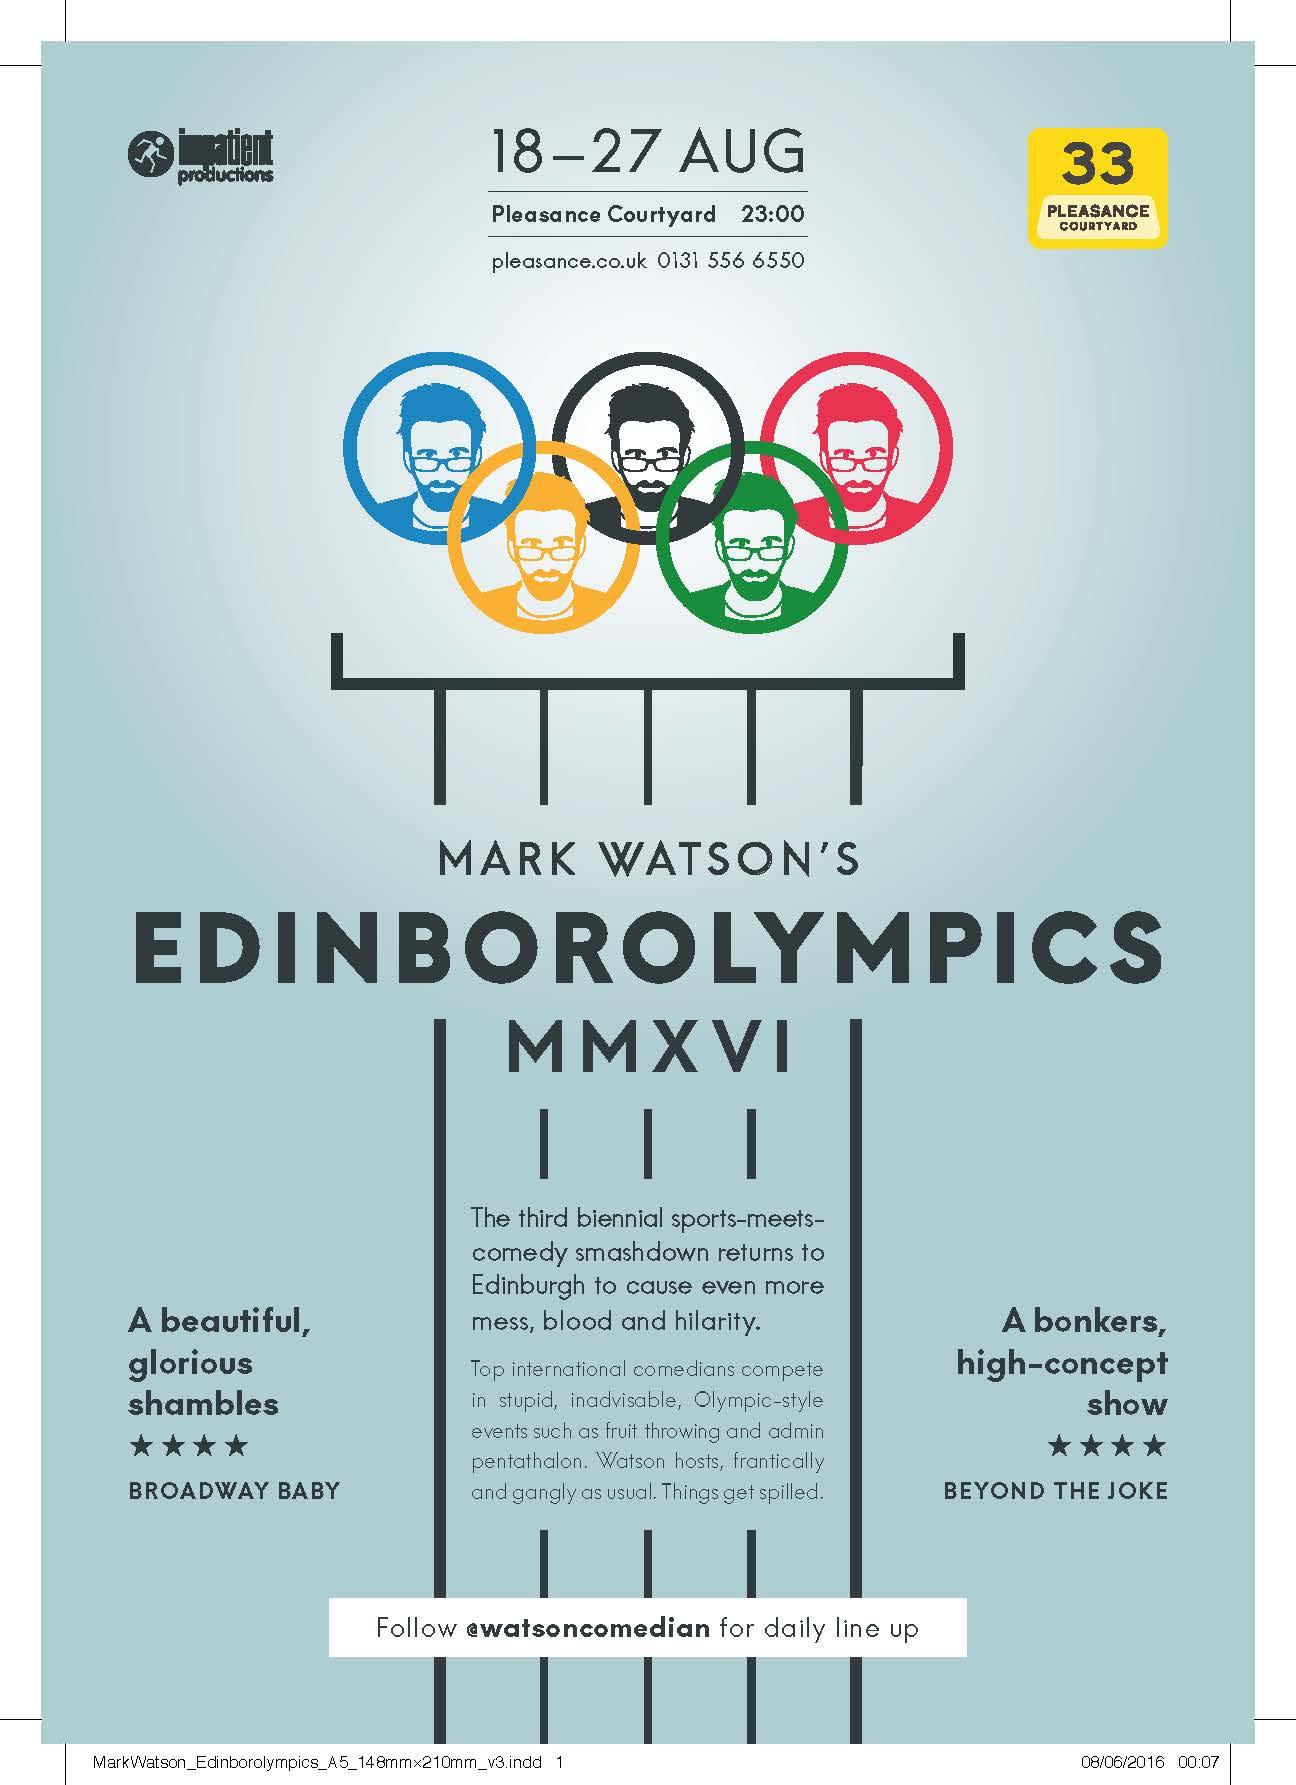 edinburgh 2016: edinborolympics